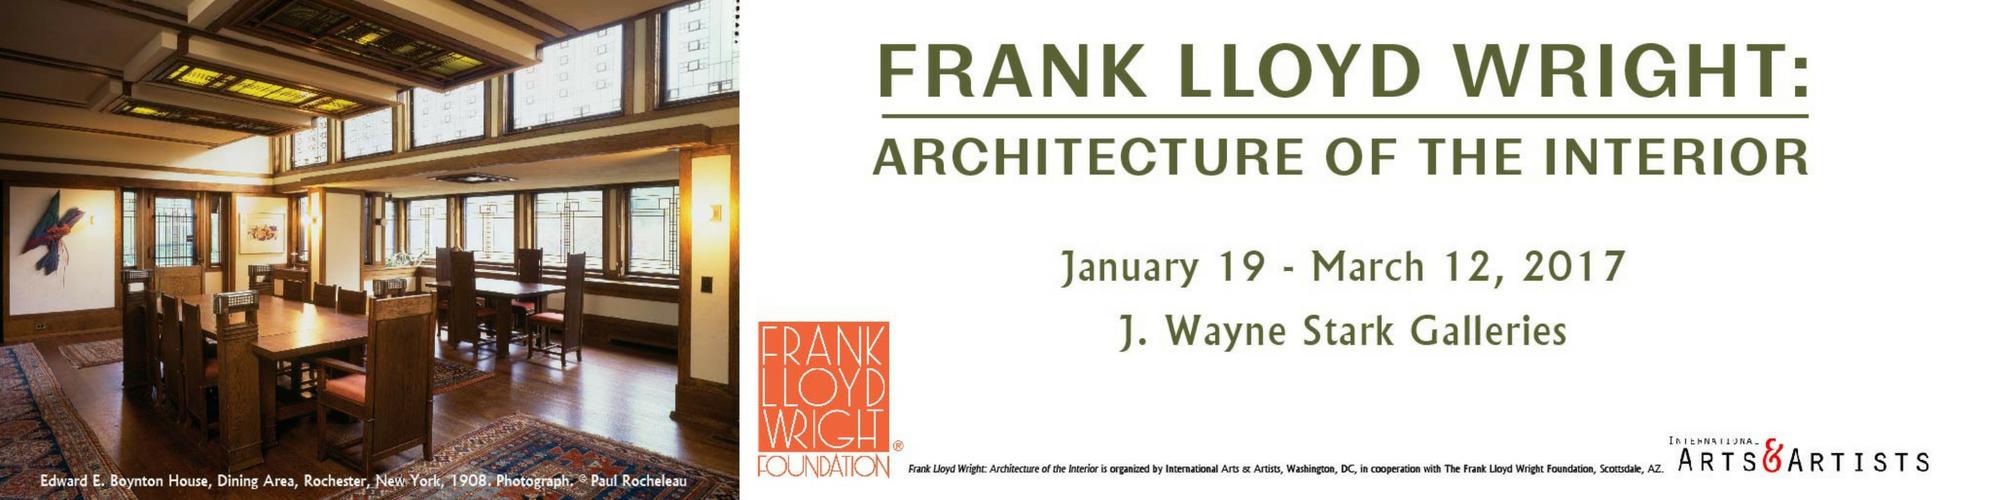 FLW web banner 1